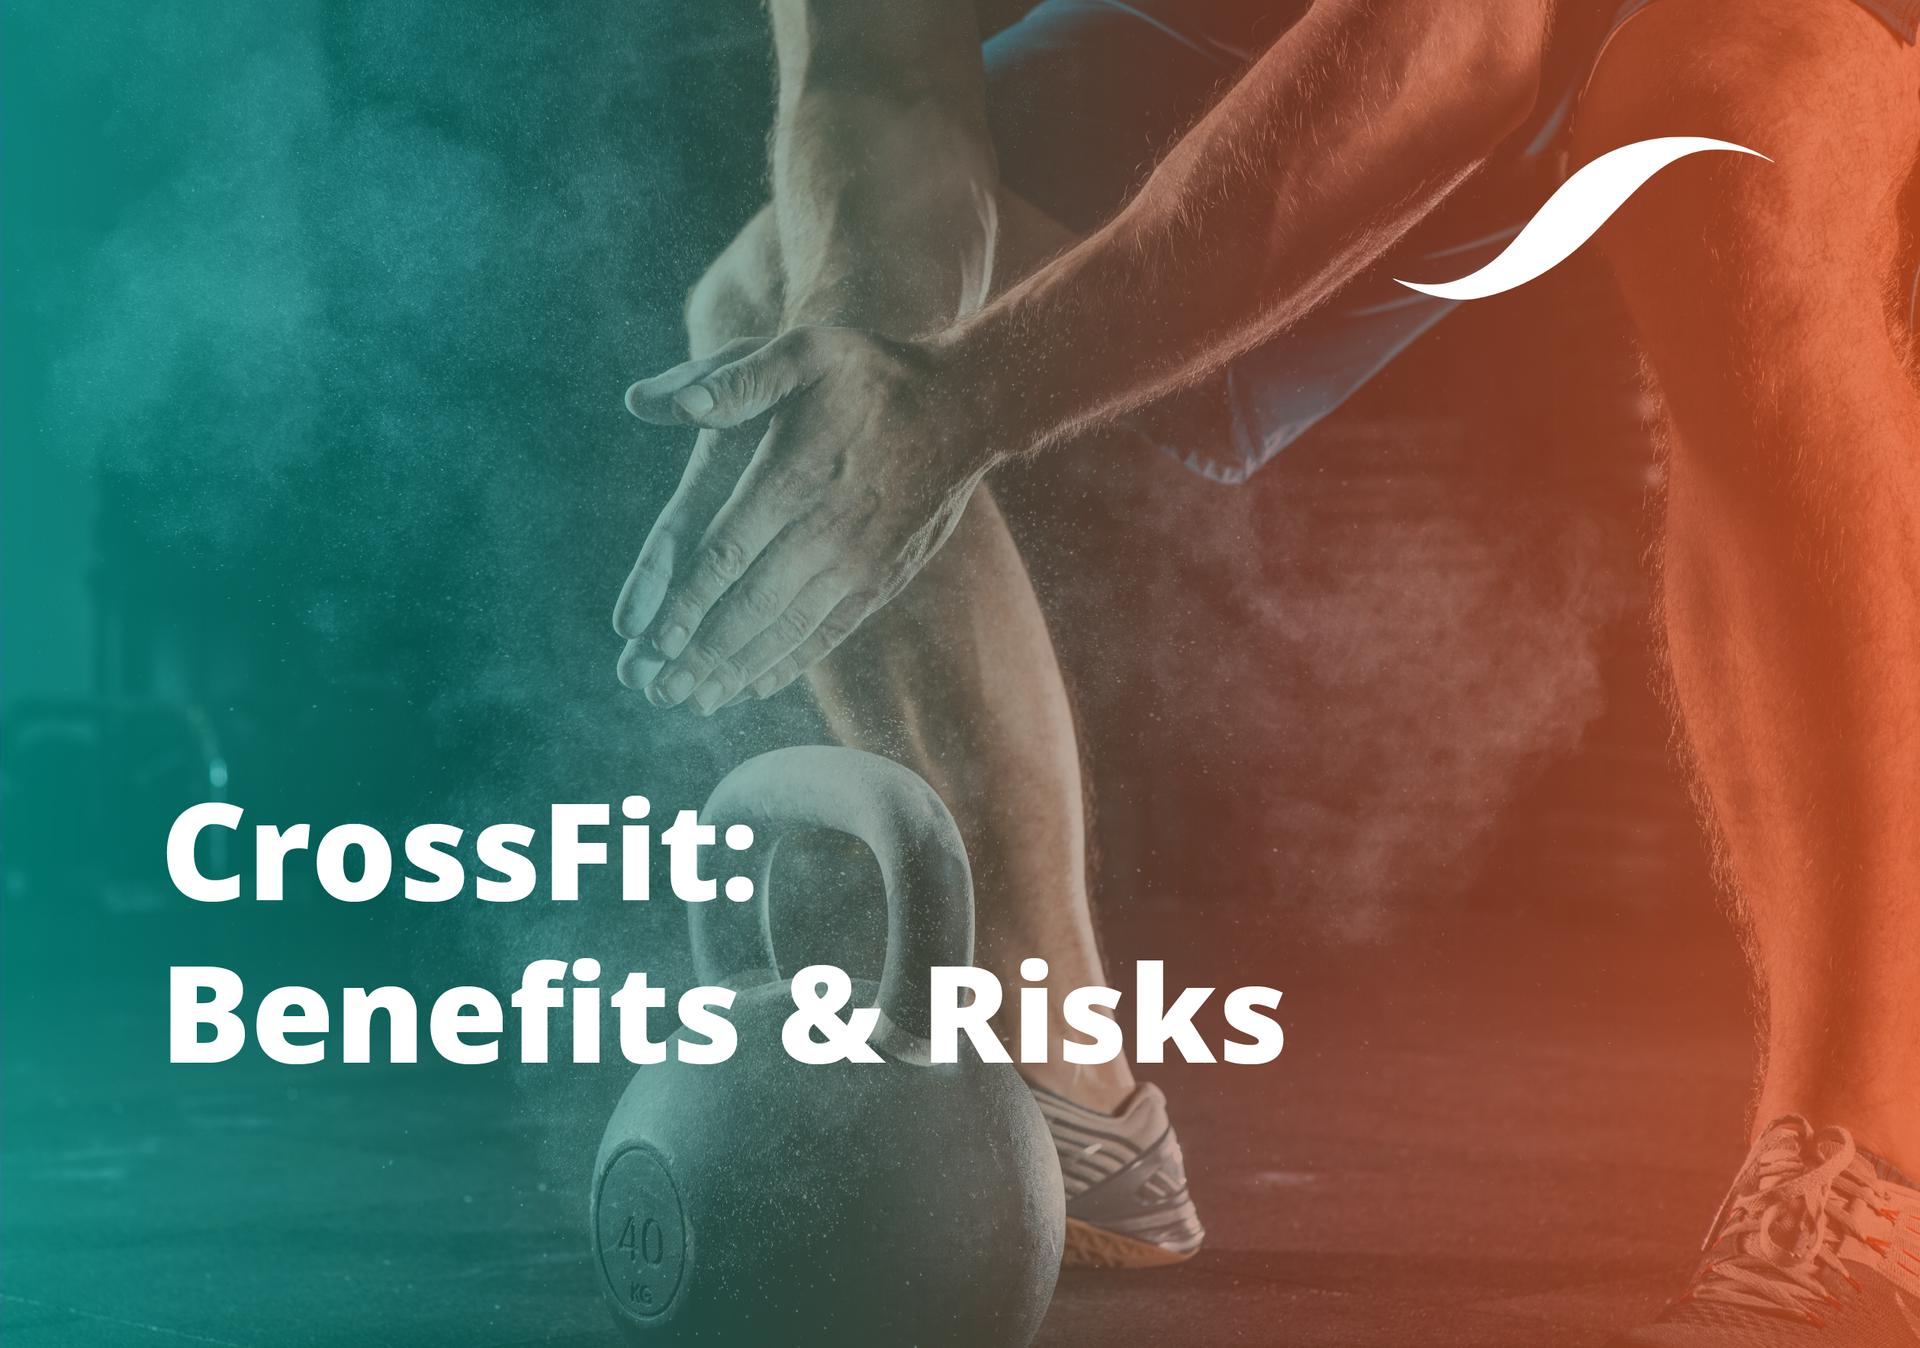 Crossfit Benefits Risks Origym